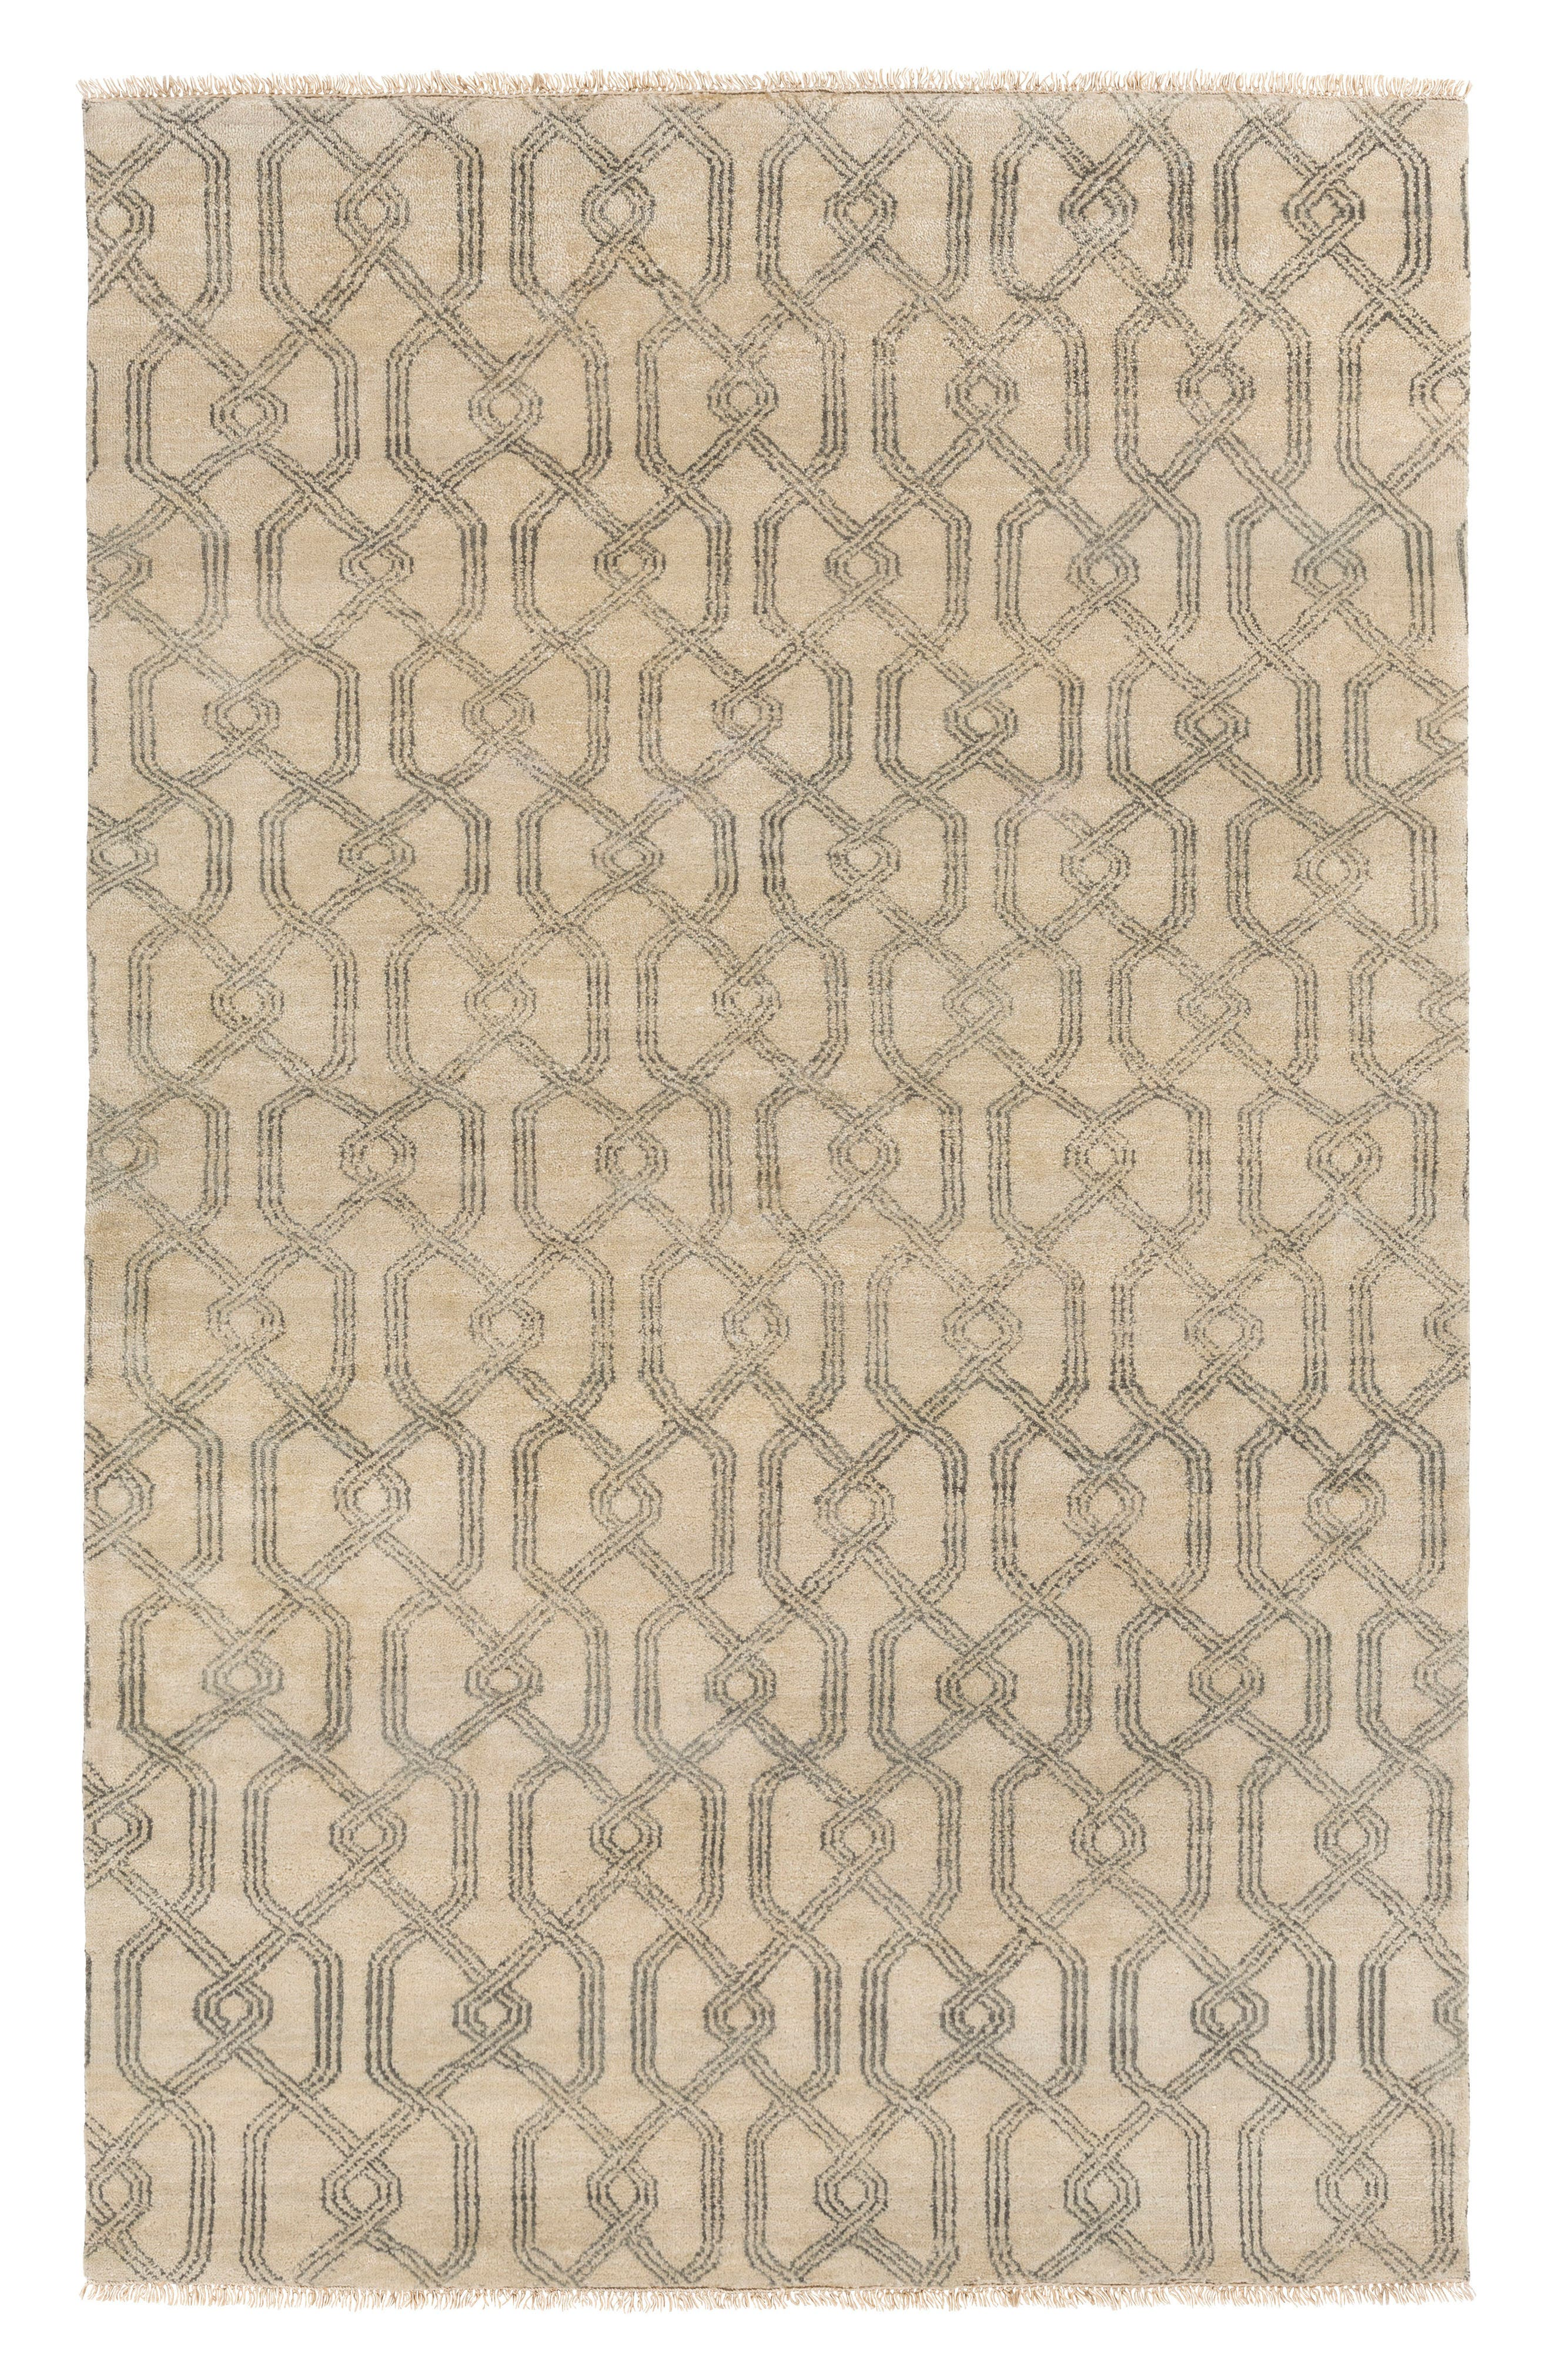 'Stanton' Wool & Cotton Rug,                             Main thumbnail 1, color,                             020